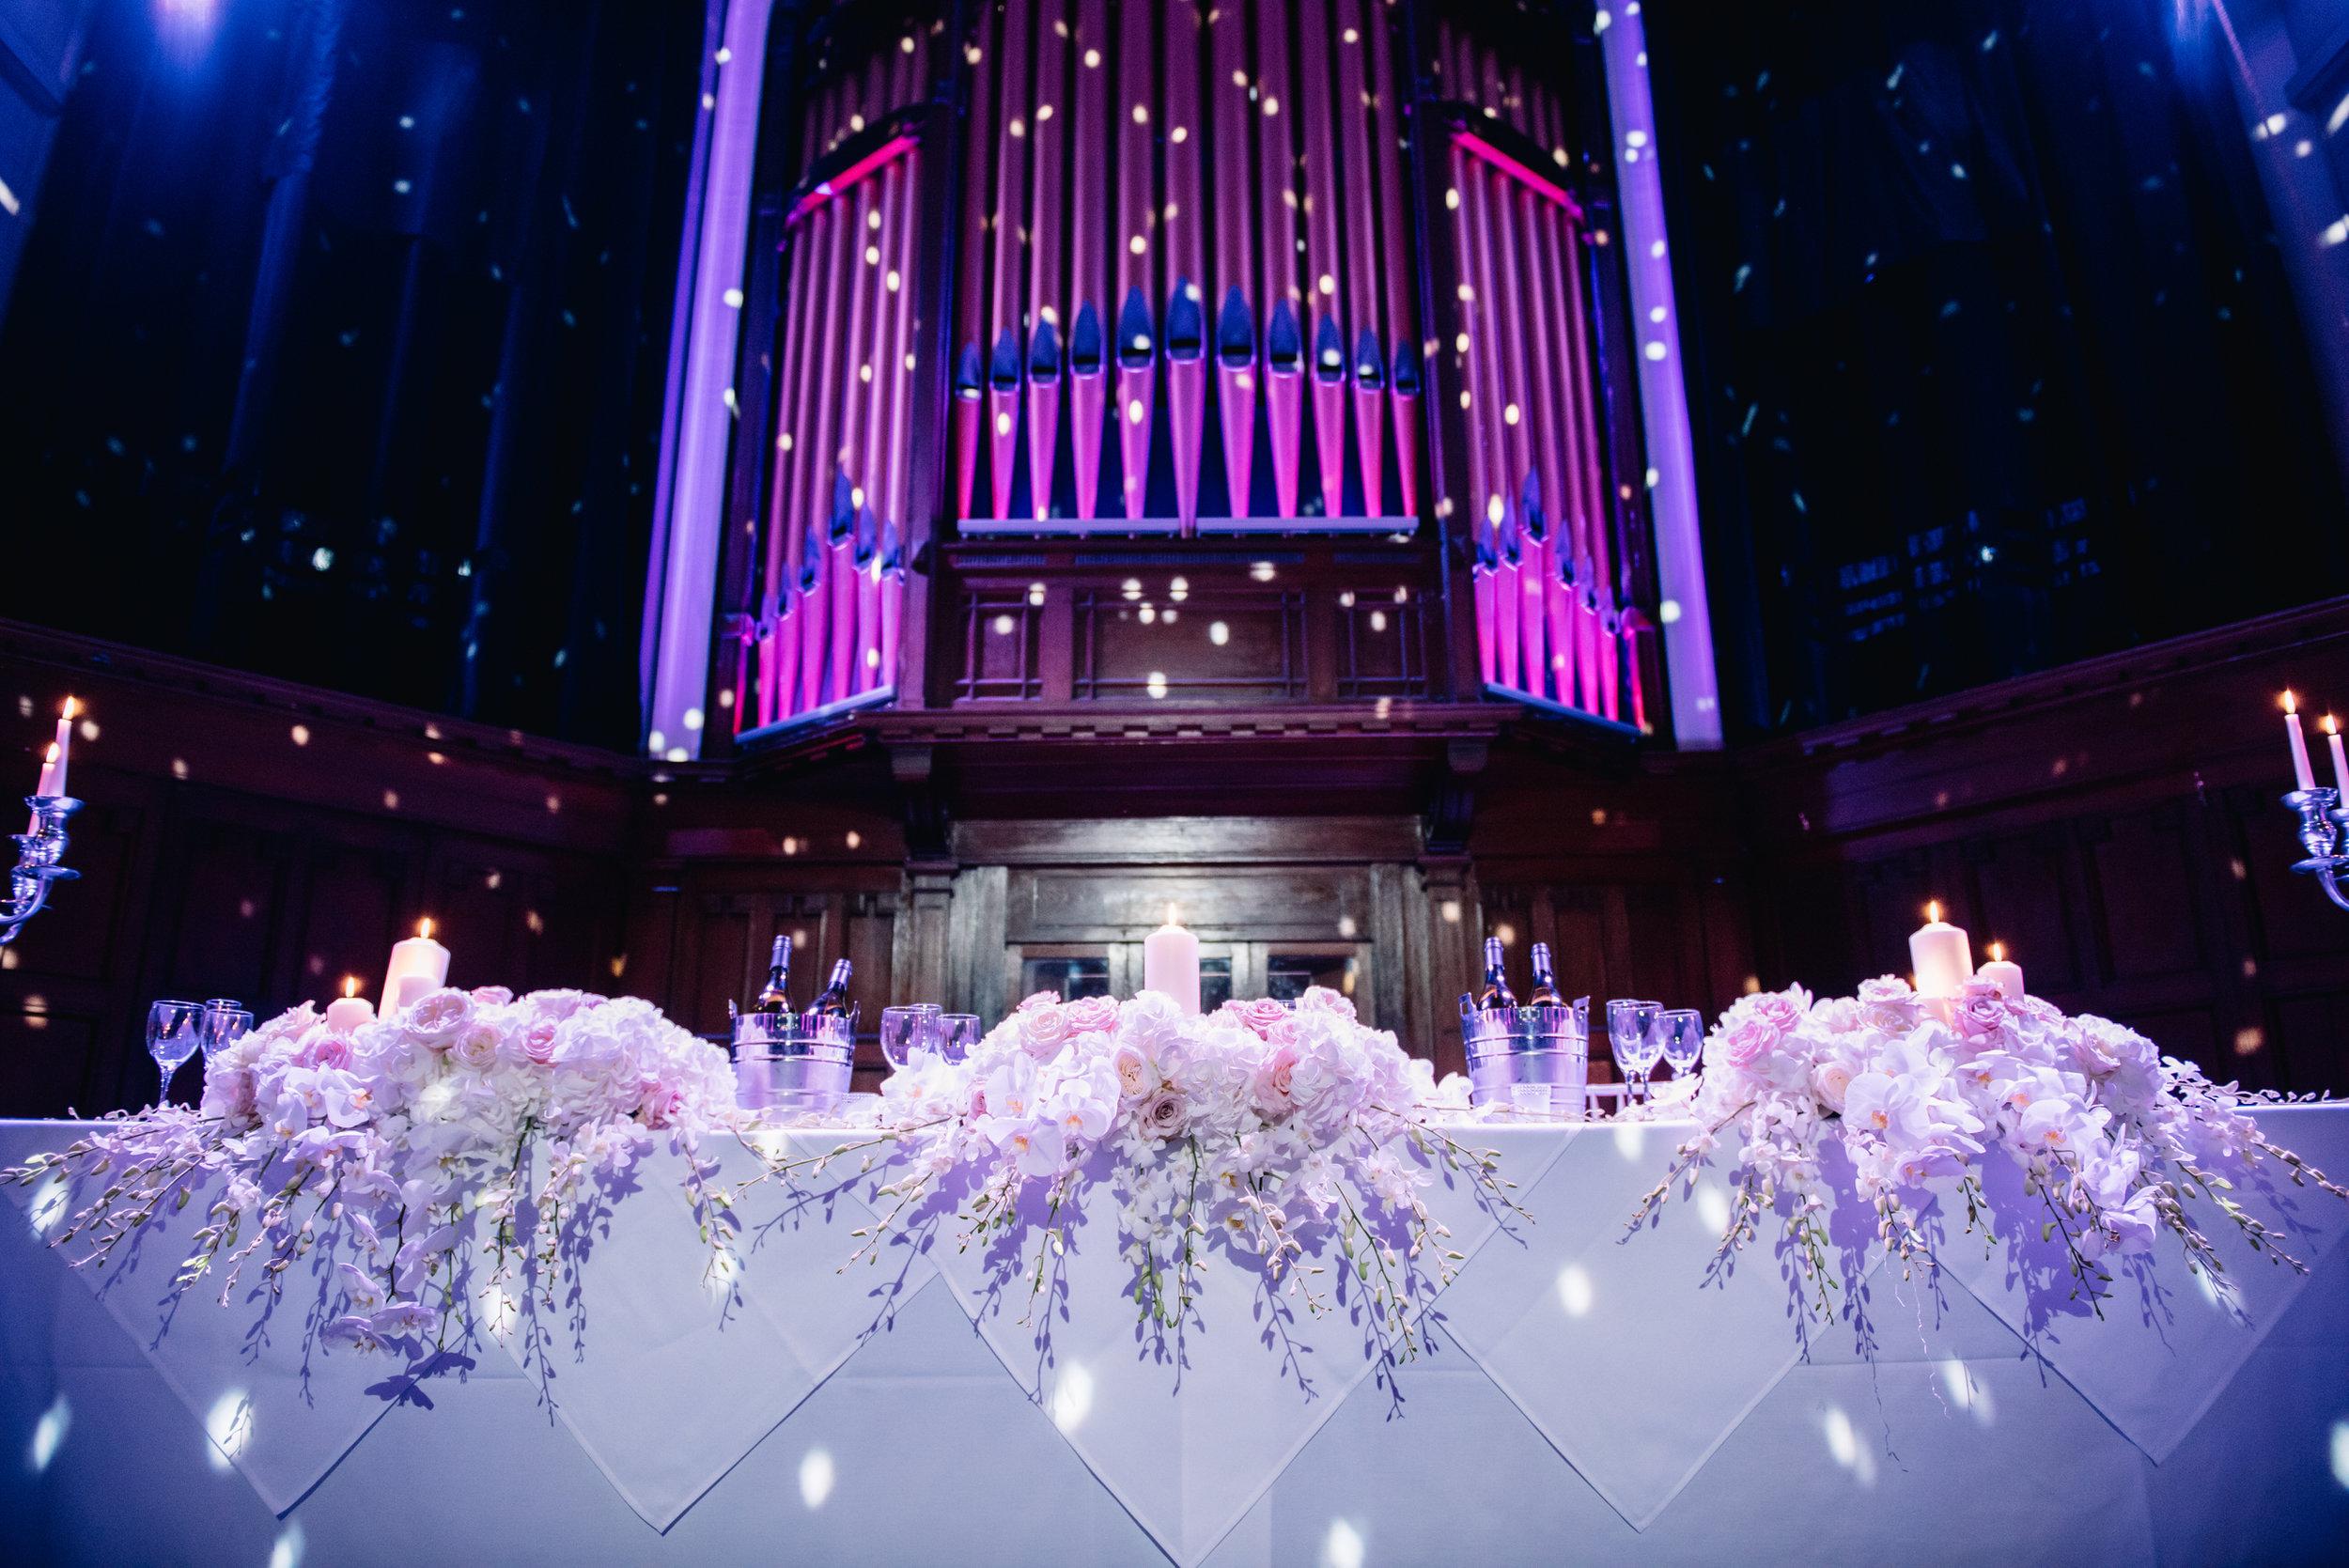 glasgow-wedding-photographerB.JPG